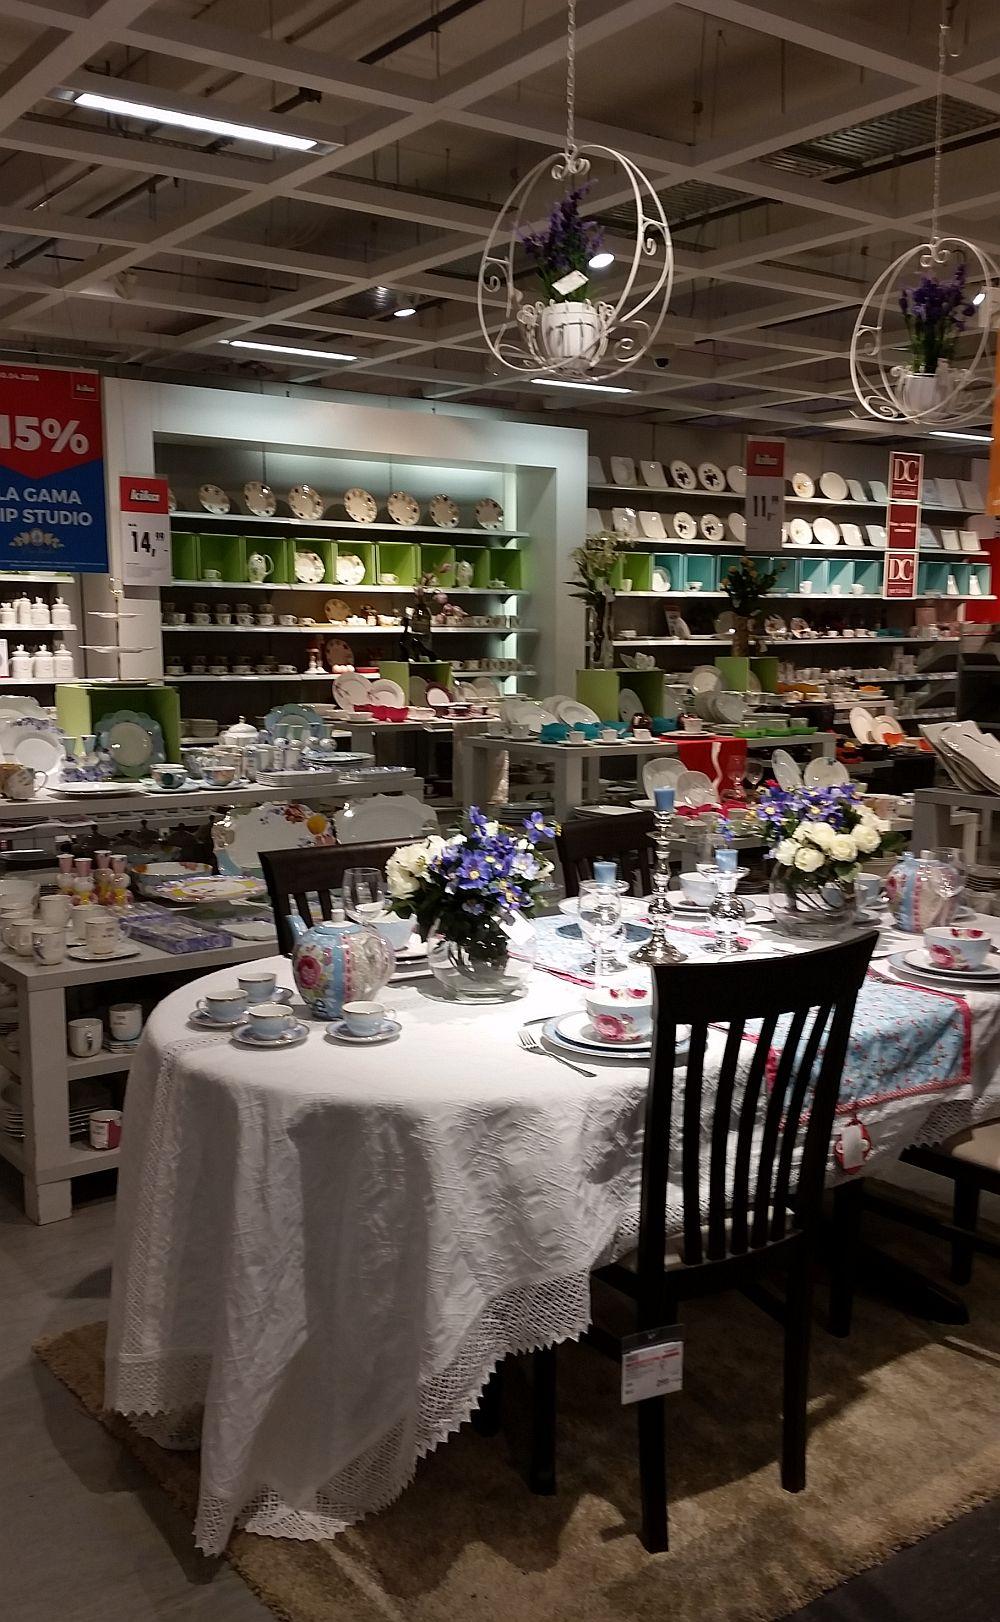 adelaparvu.com despre decoratiuni si vesela Kika, decorul mesei de Paste (18)